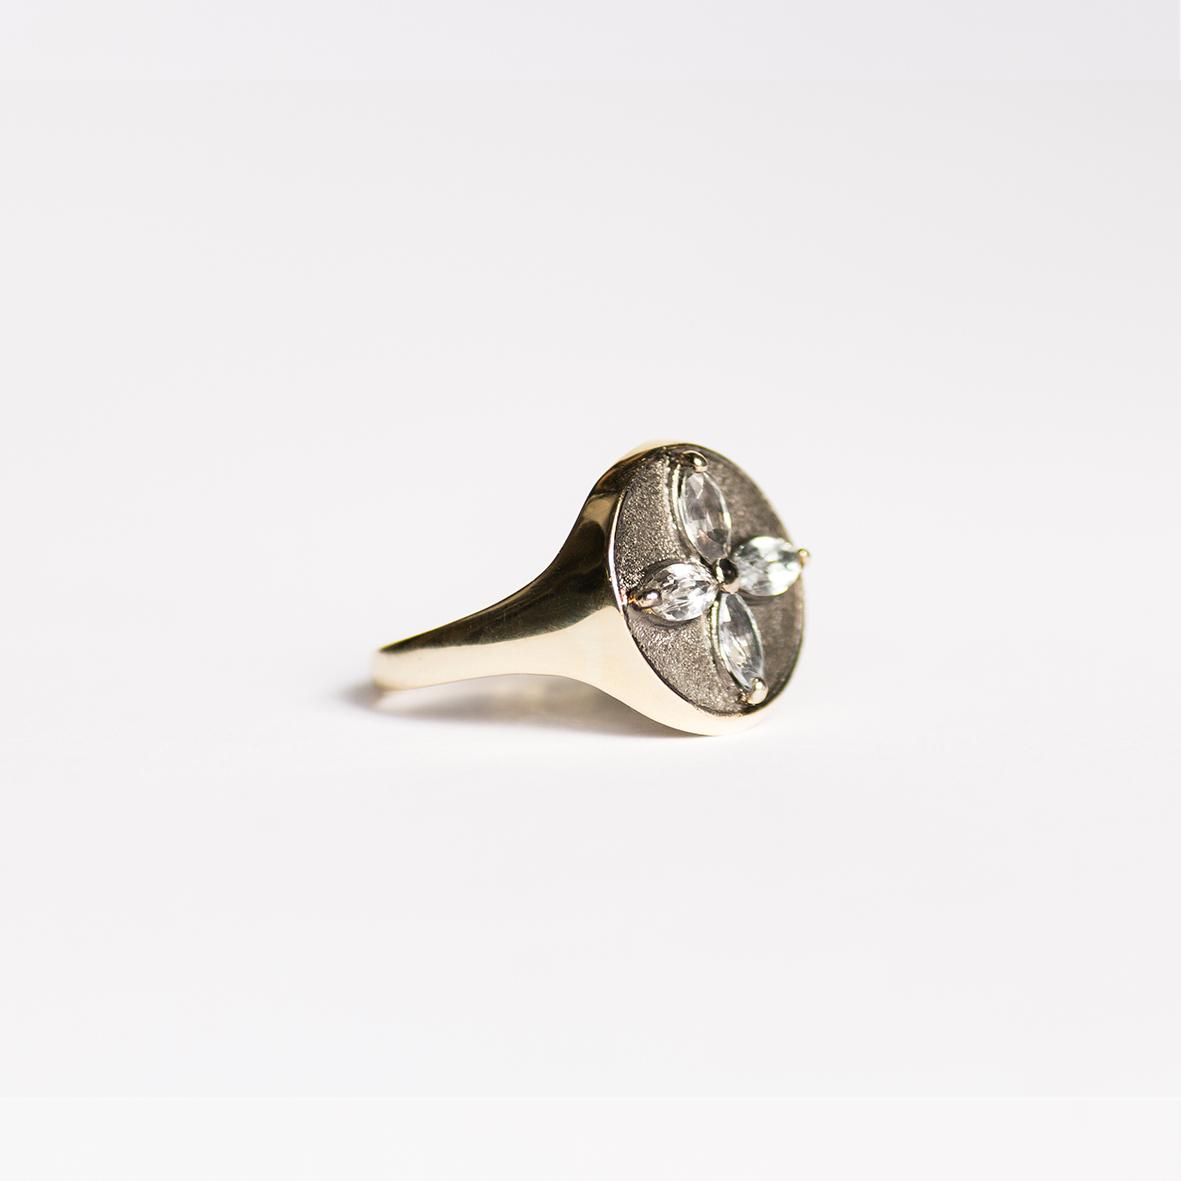 1. OONA_lotus_ficha2_signet flower sapphire ring